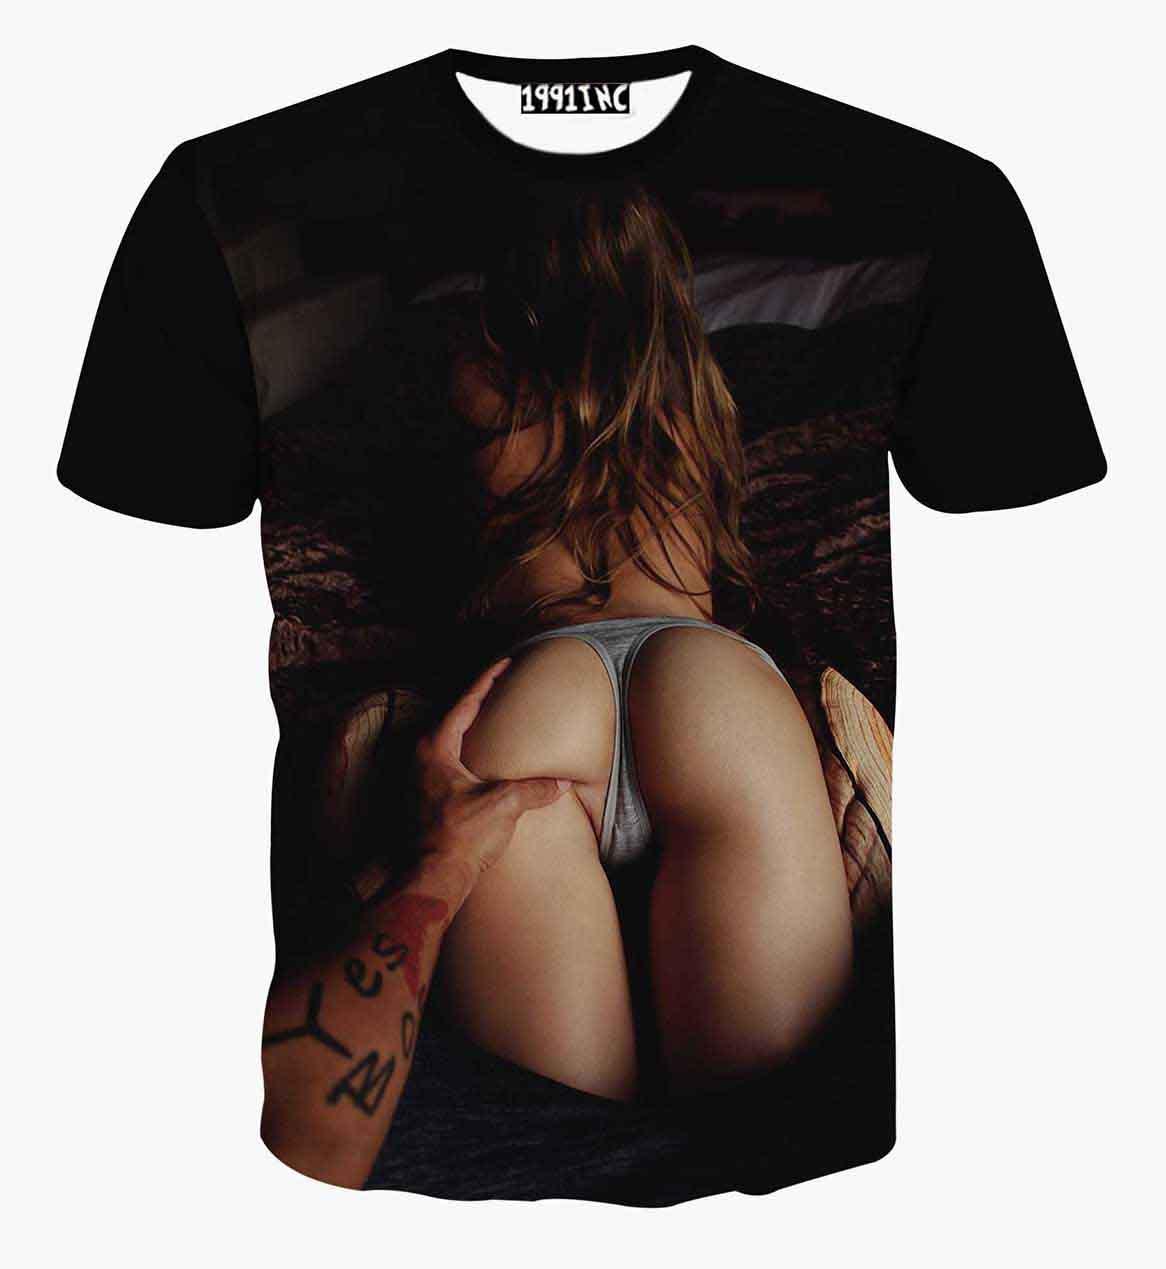 sexy shirt t womens: